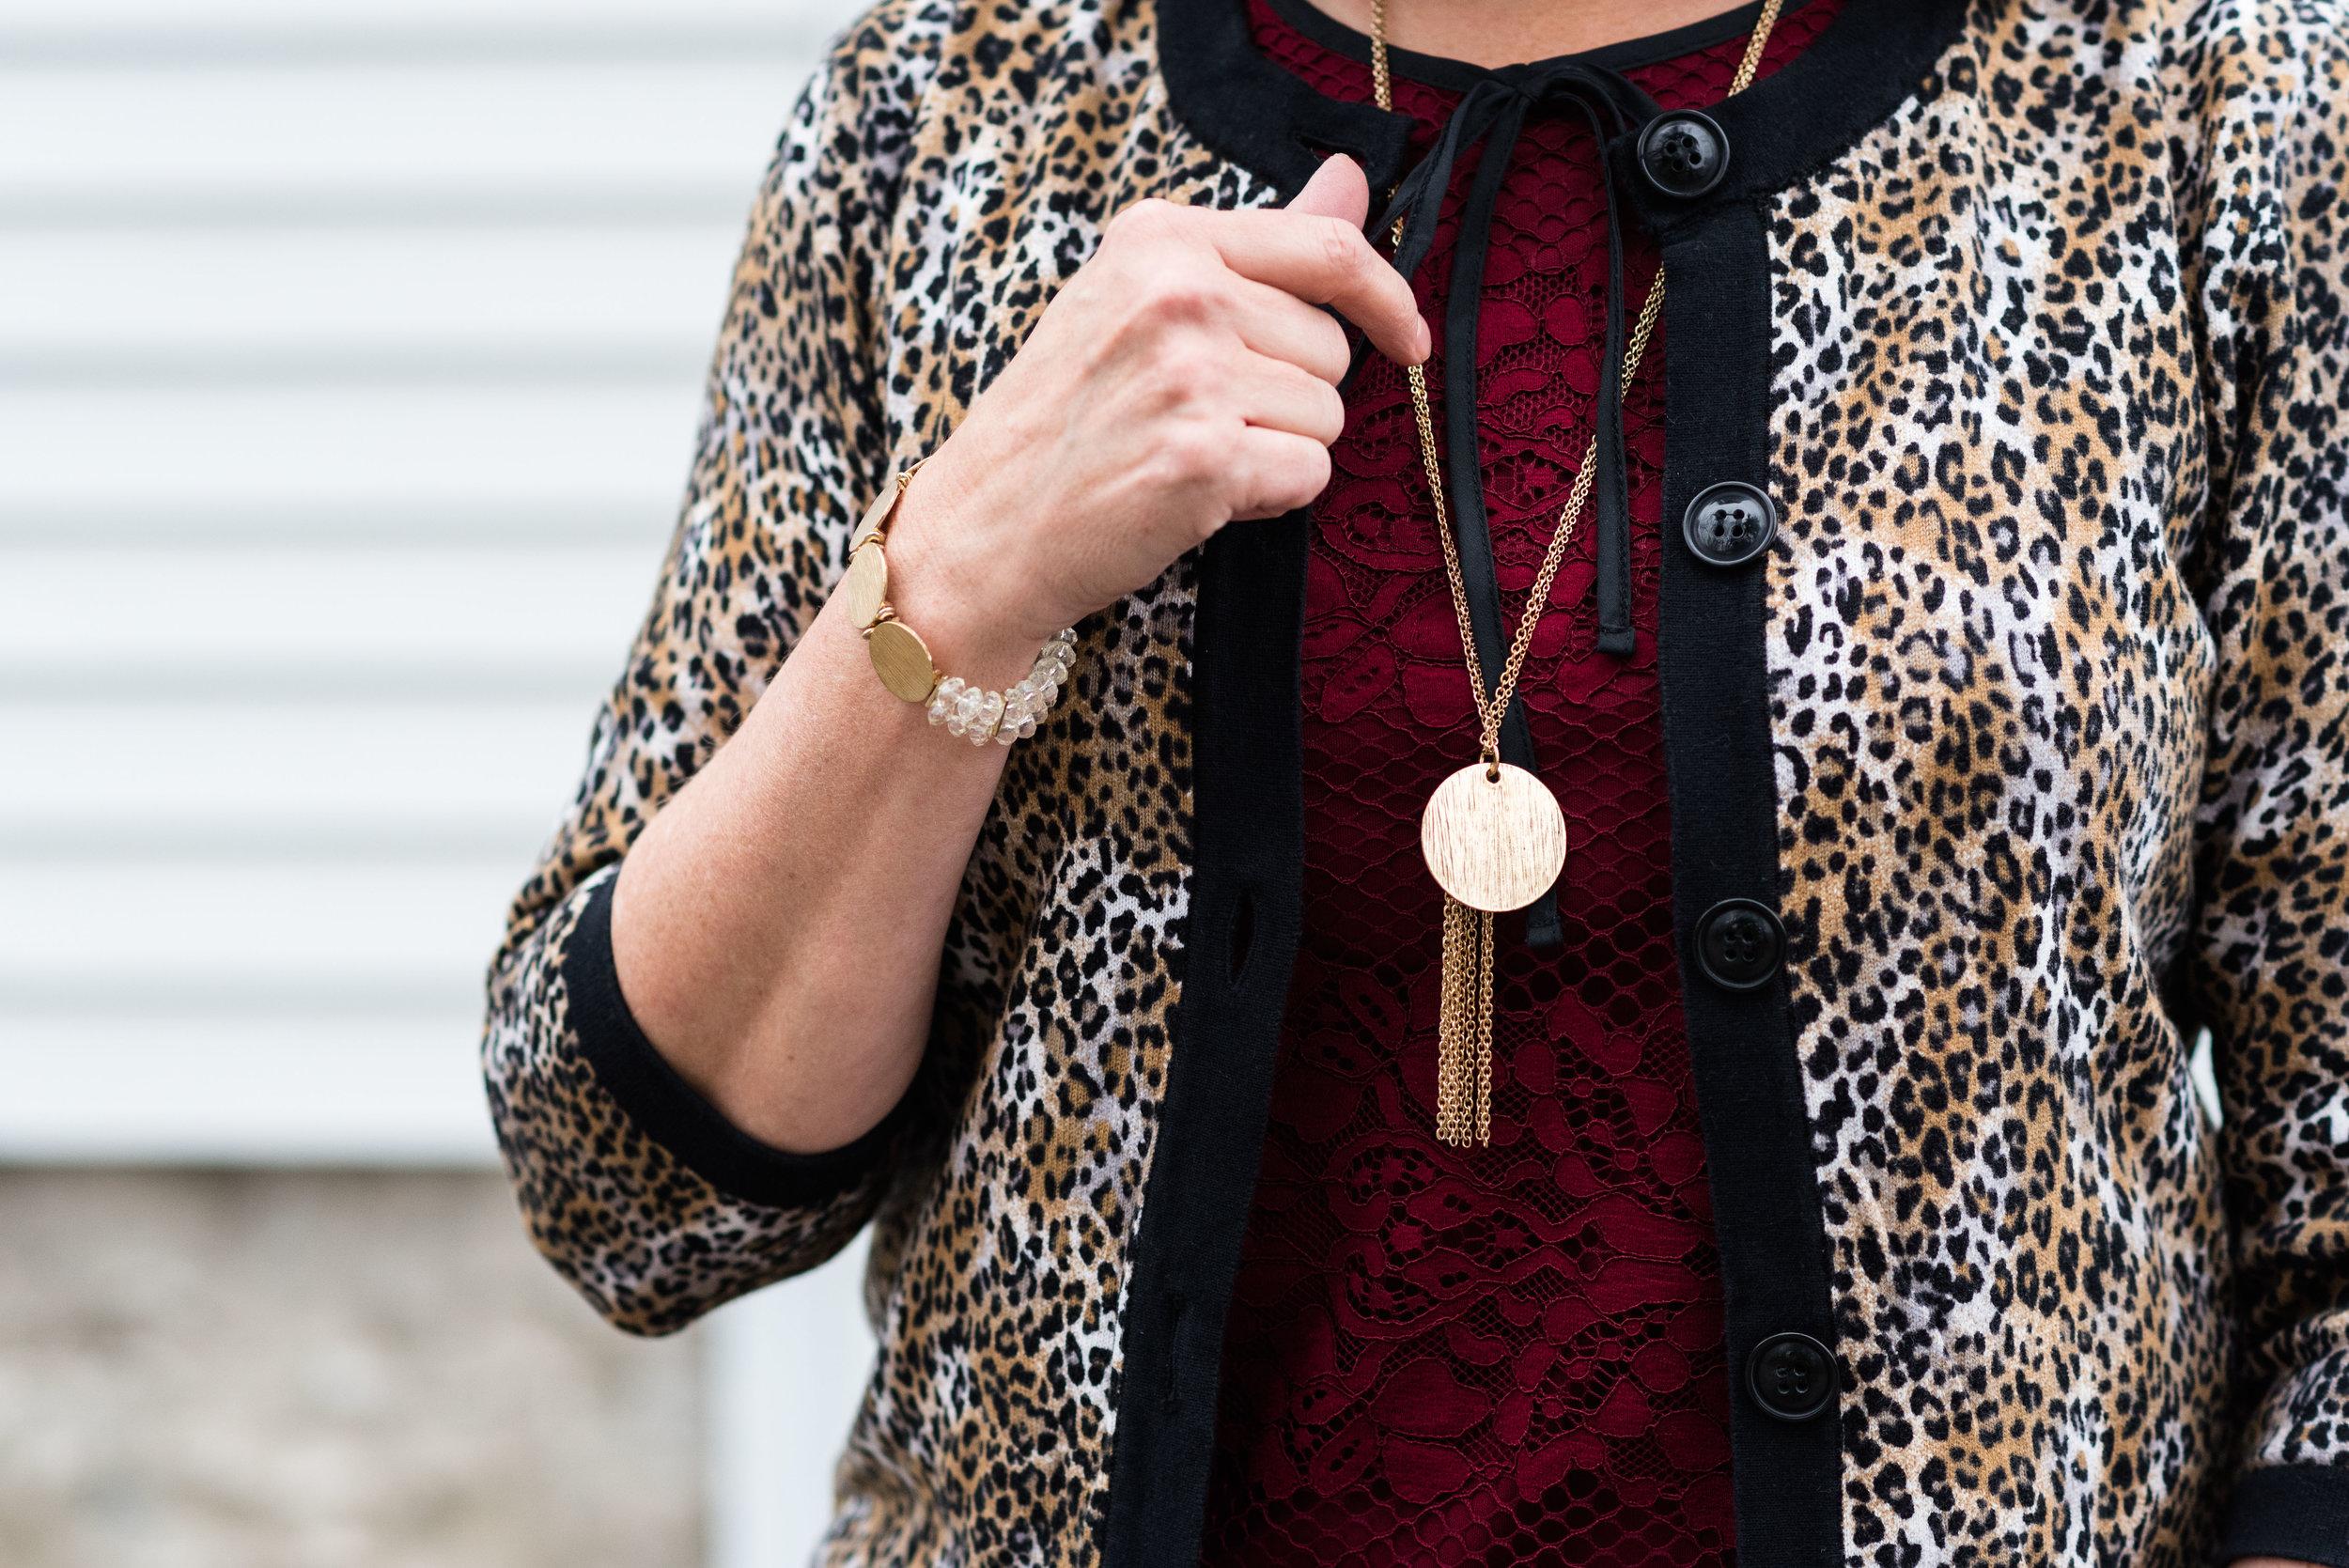 winter outfits fashion blog leopard print cardigan-7.jpg